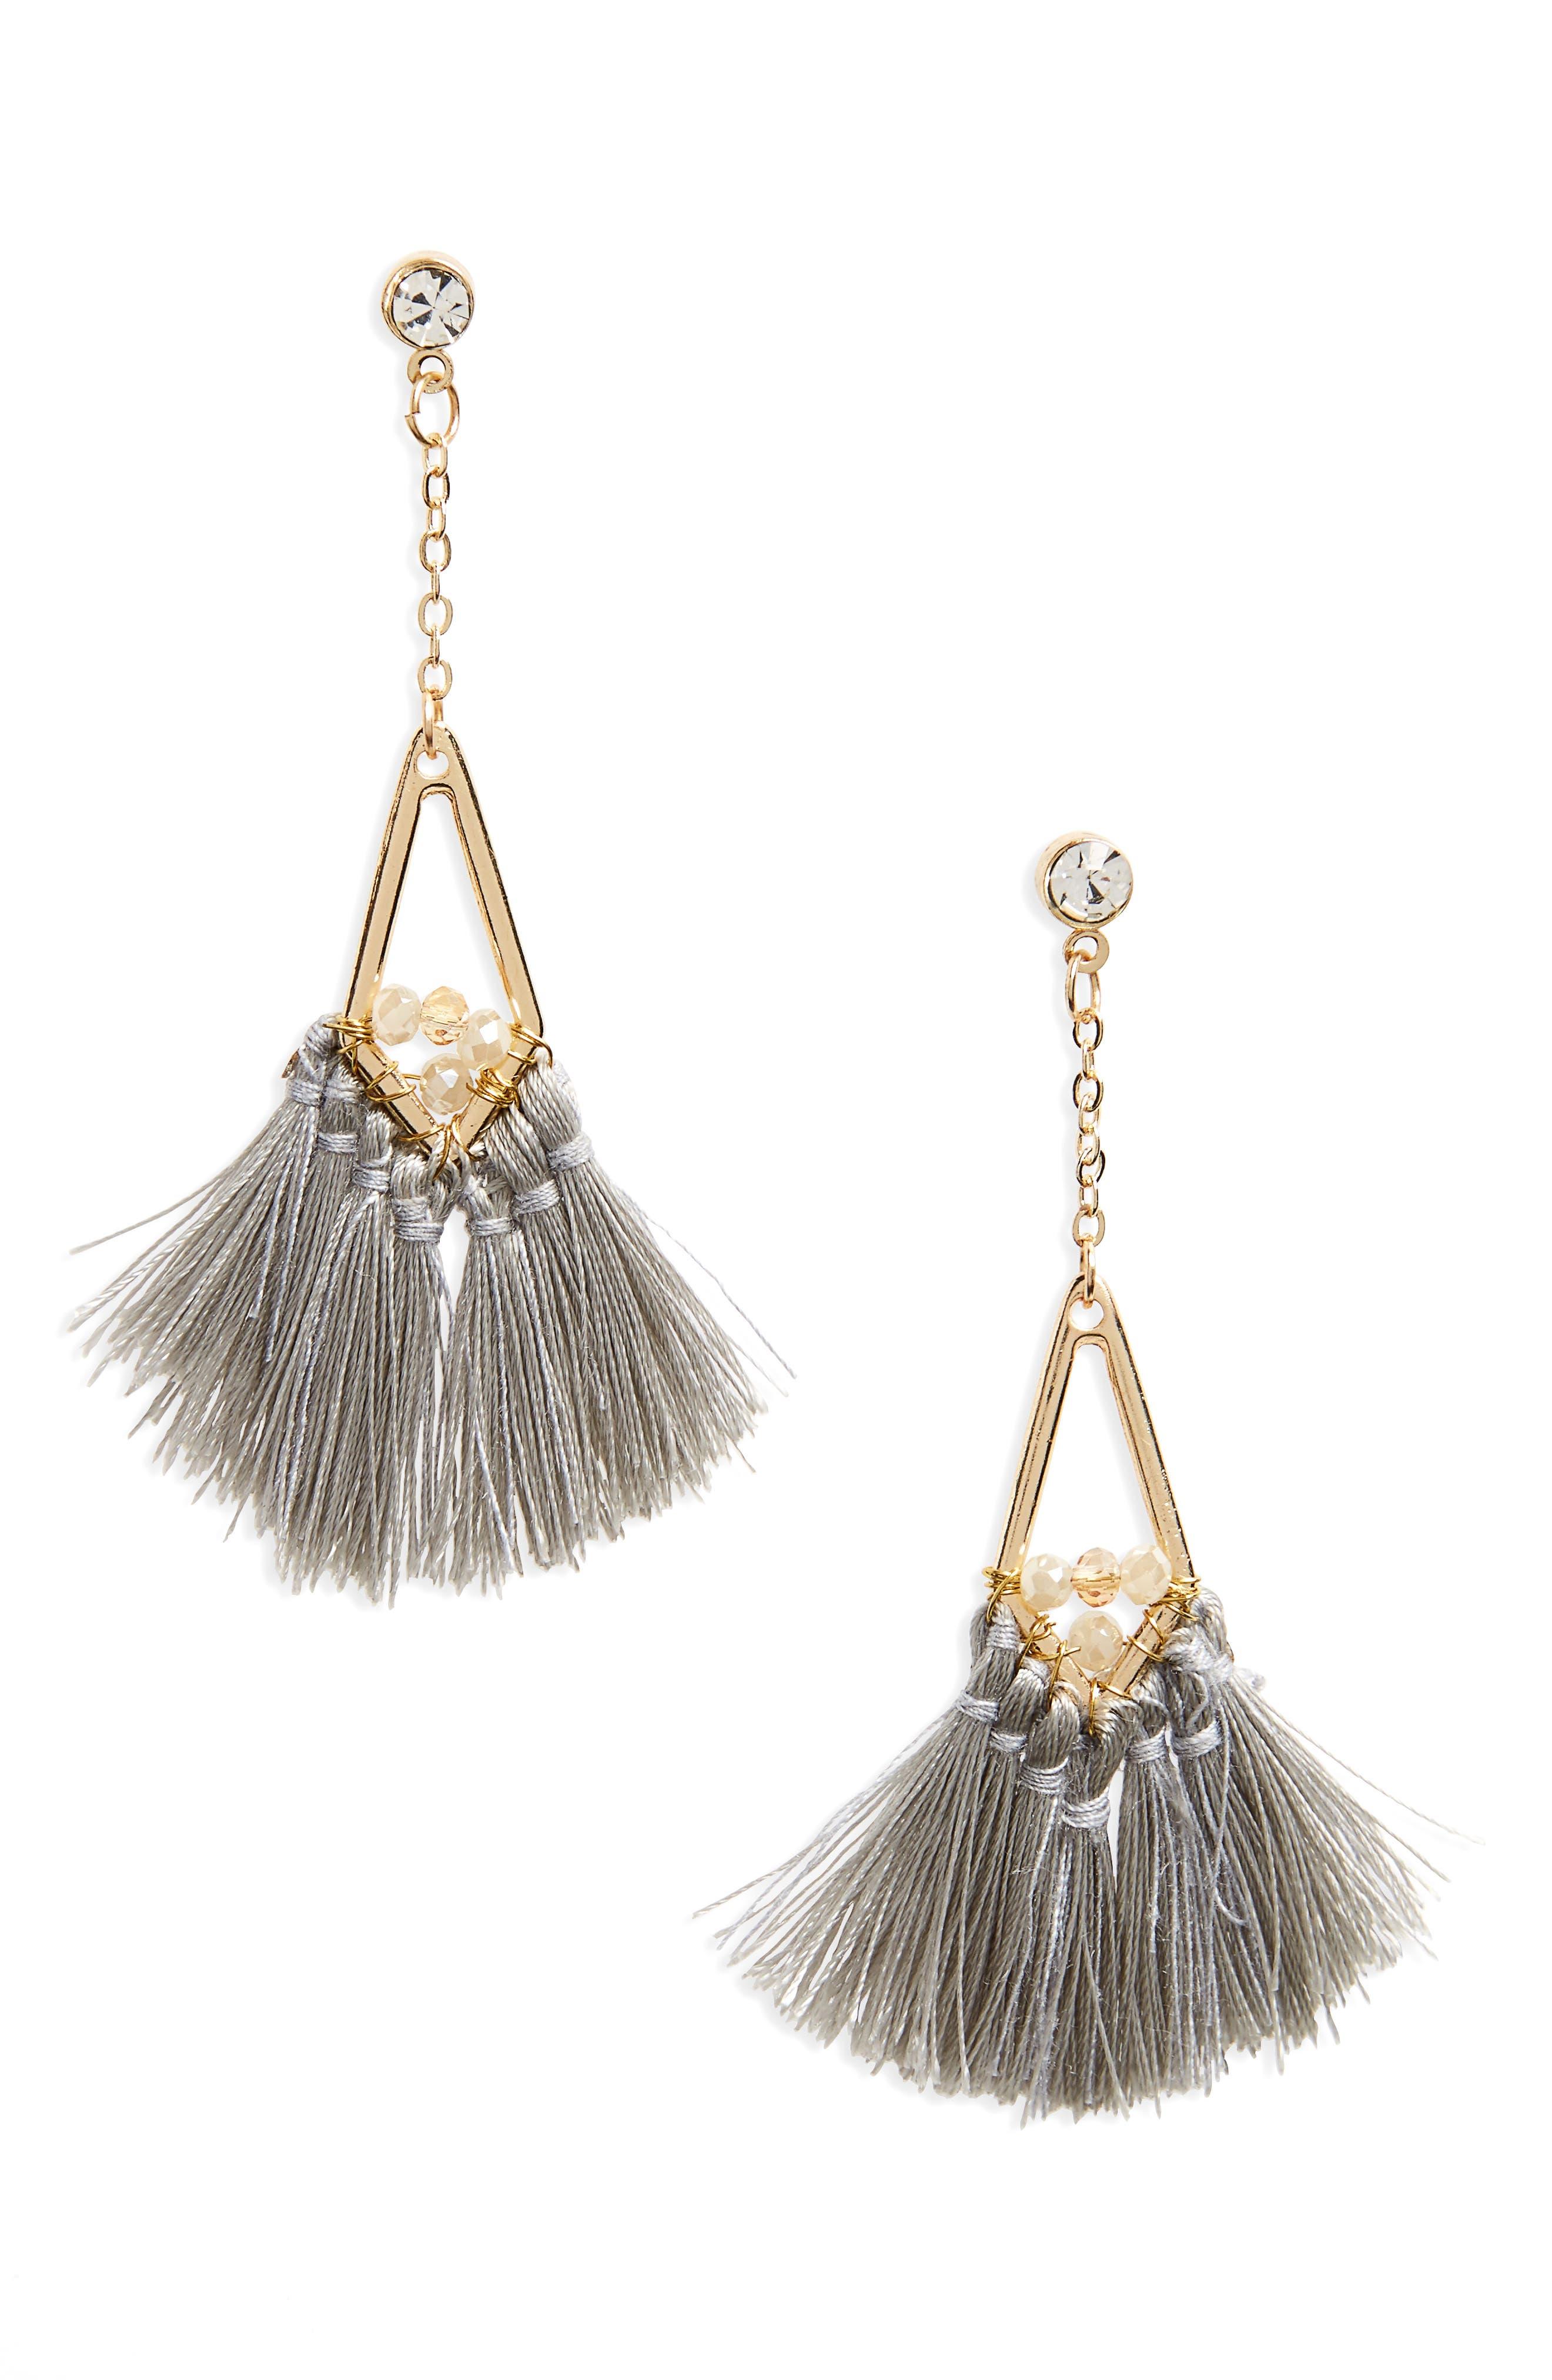 Tassel Fan Drop Earrings,                             Main thumbnail 1, color,                             Gold/ Crystal/ Gray